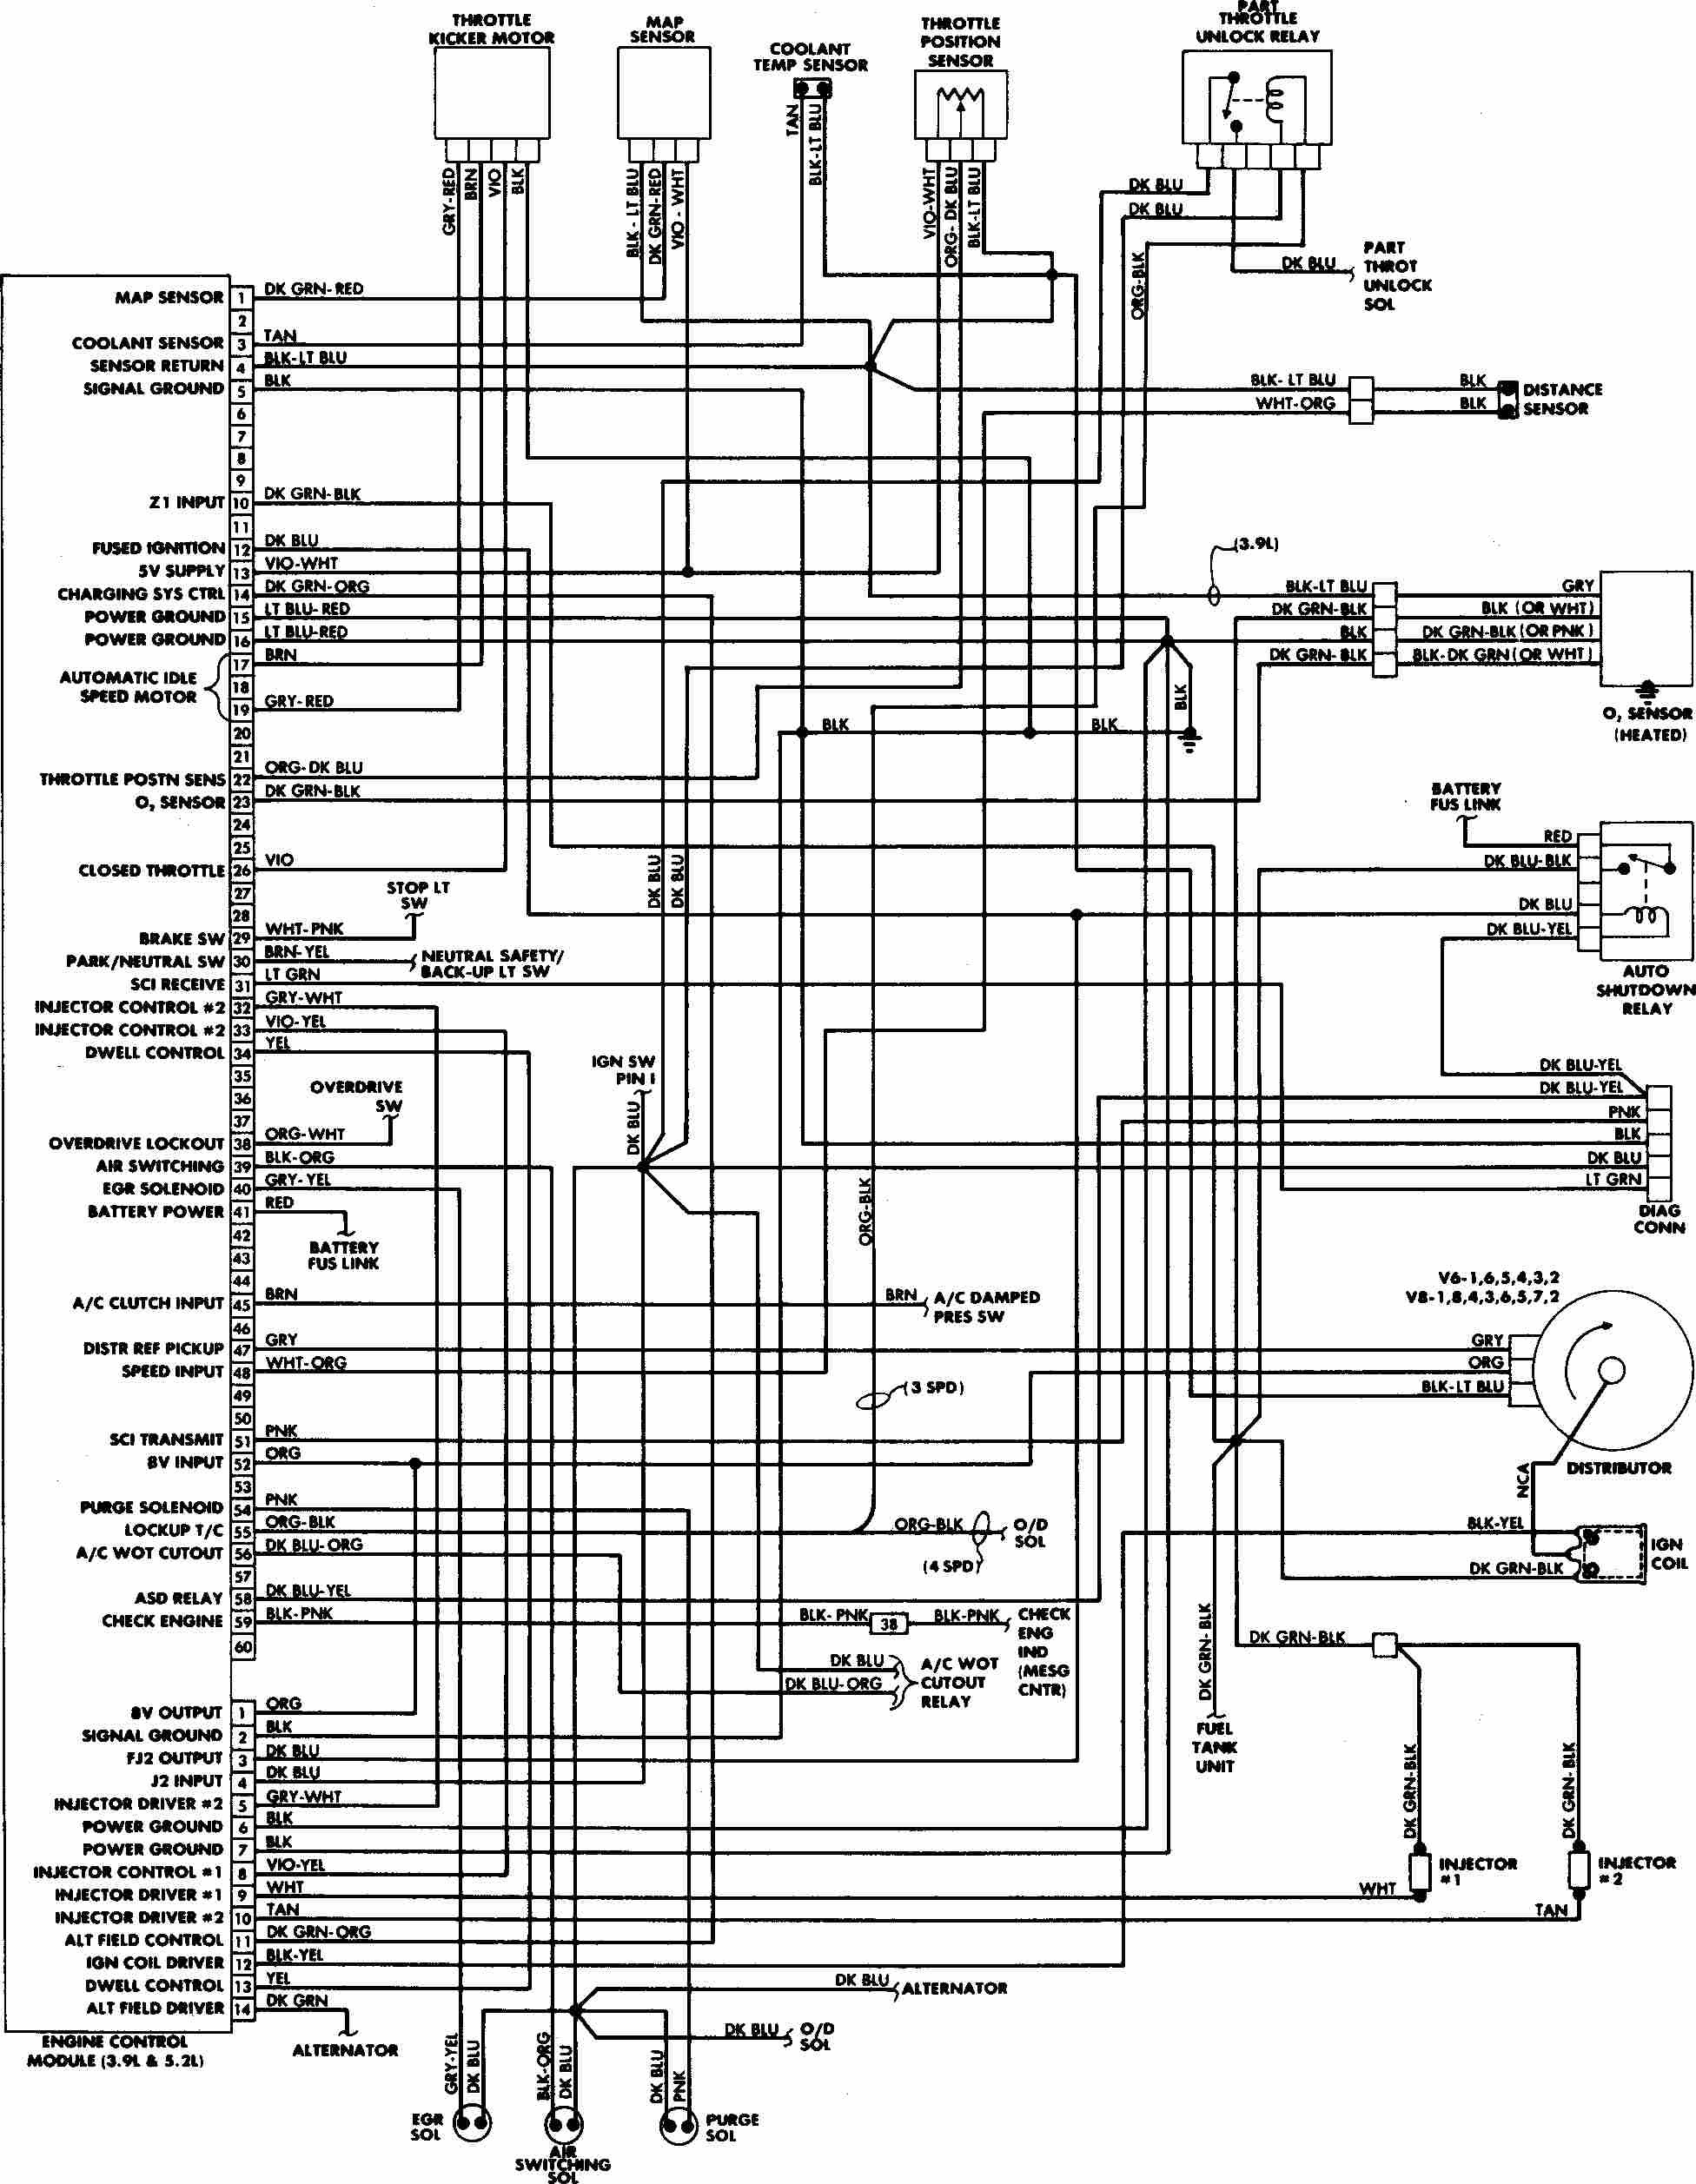 Wiring Diagram For 98 Malibu Free Download